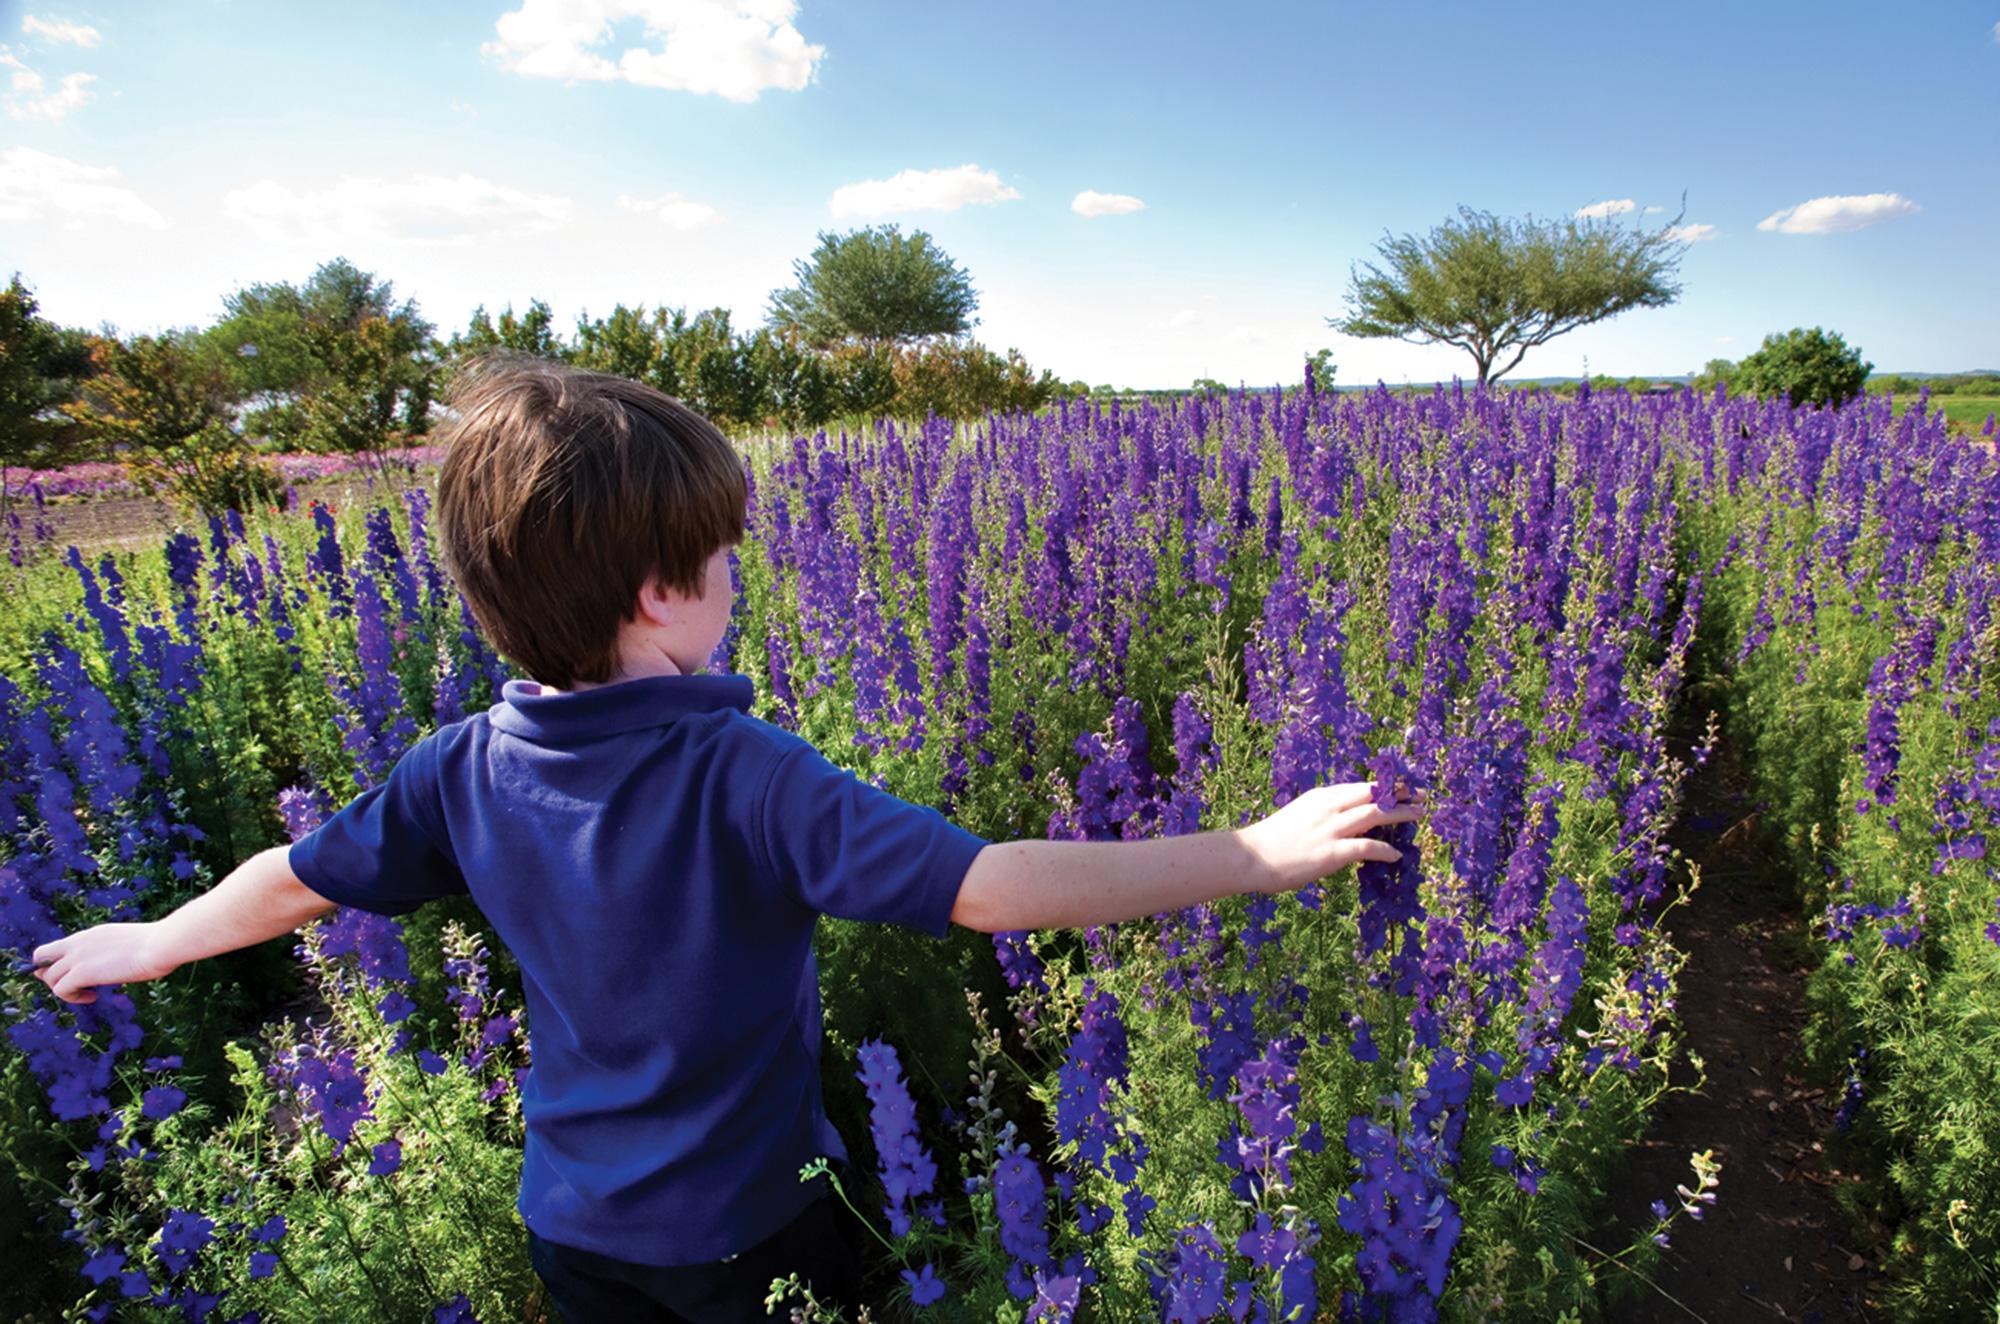 bluebonnets at Wildseed Farms in Fredericksburg, Texas; Photo by Steve Rawls/courtesy Fredericksburg CVB